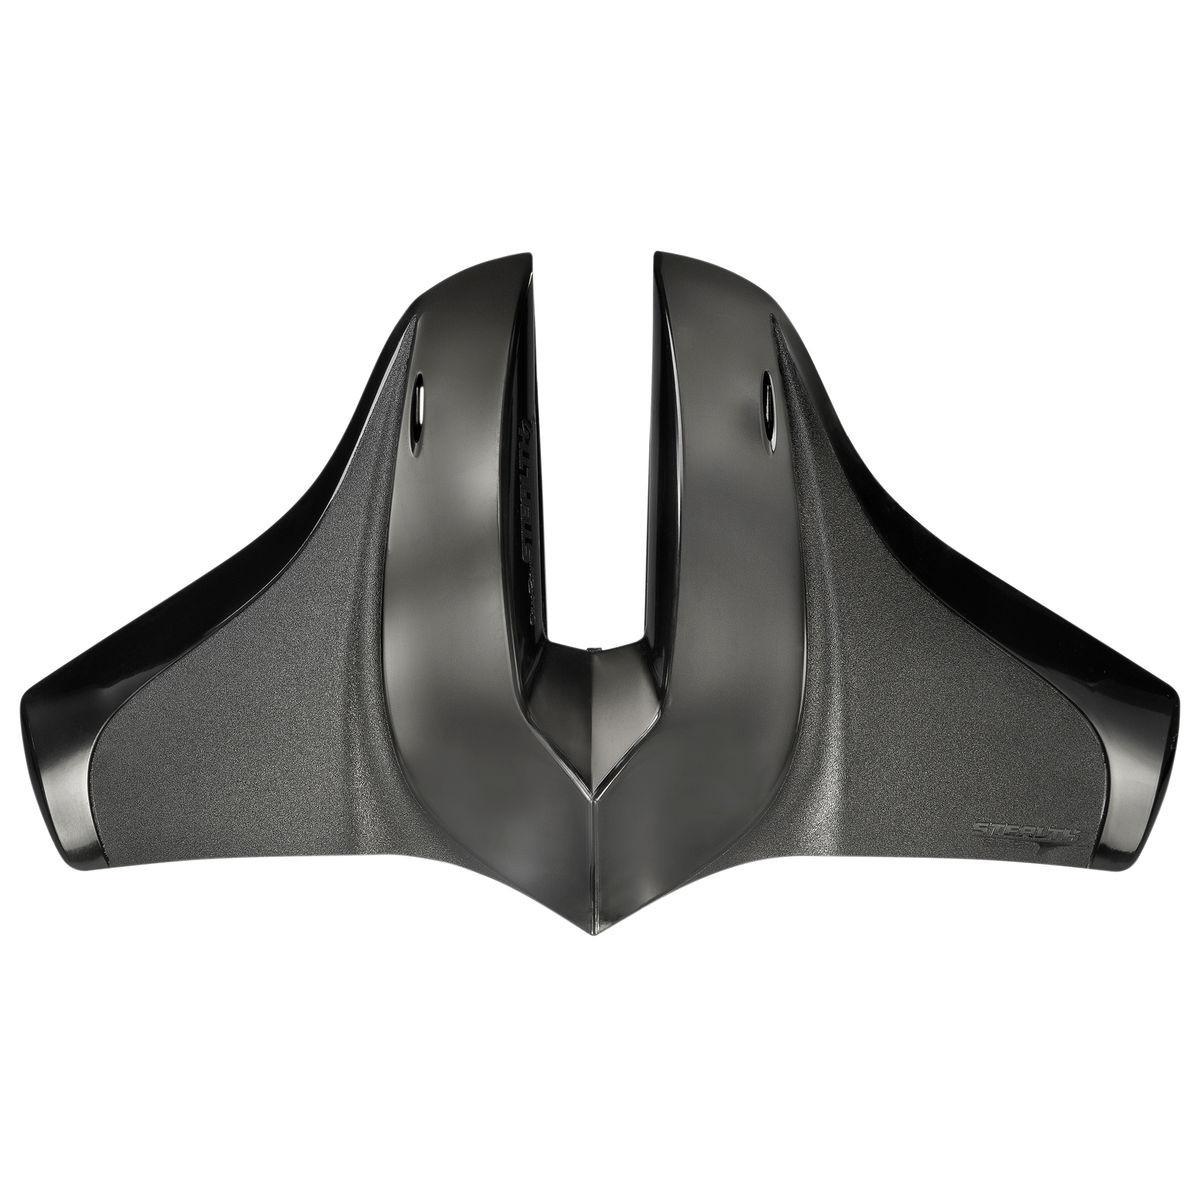 Гидрокрыло StingRay Stealth 2, 75-300 л.с.